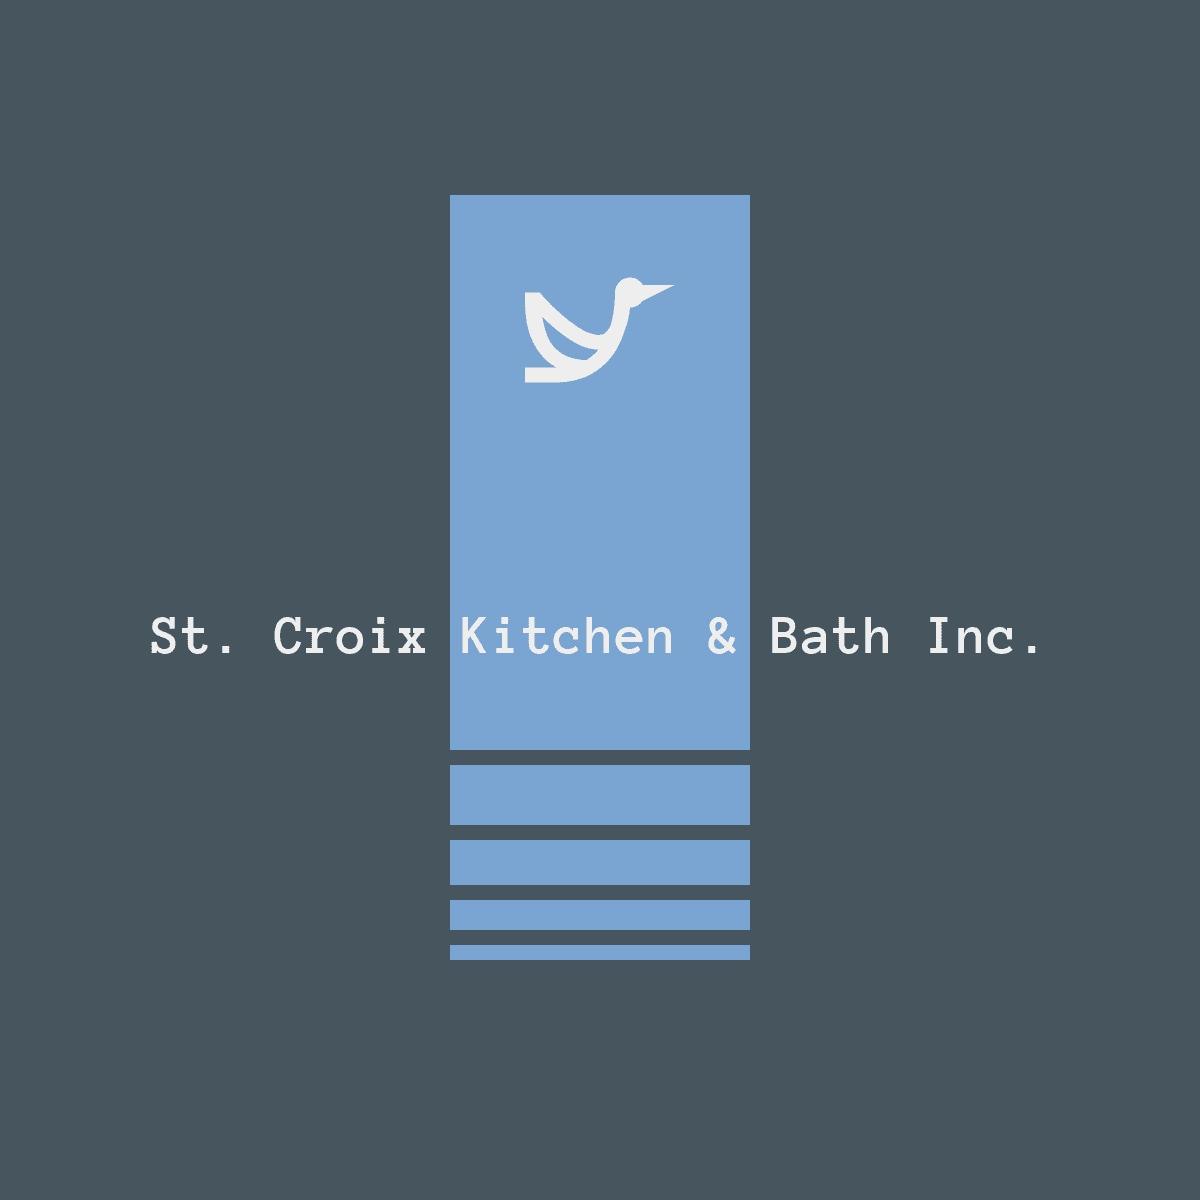 St. Croix Kitchen & Bath Inc.